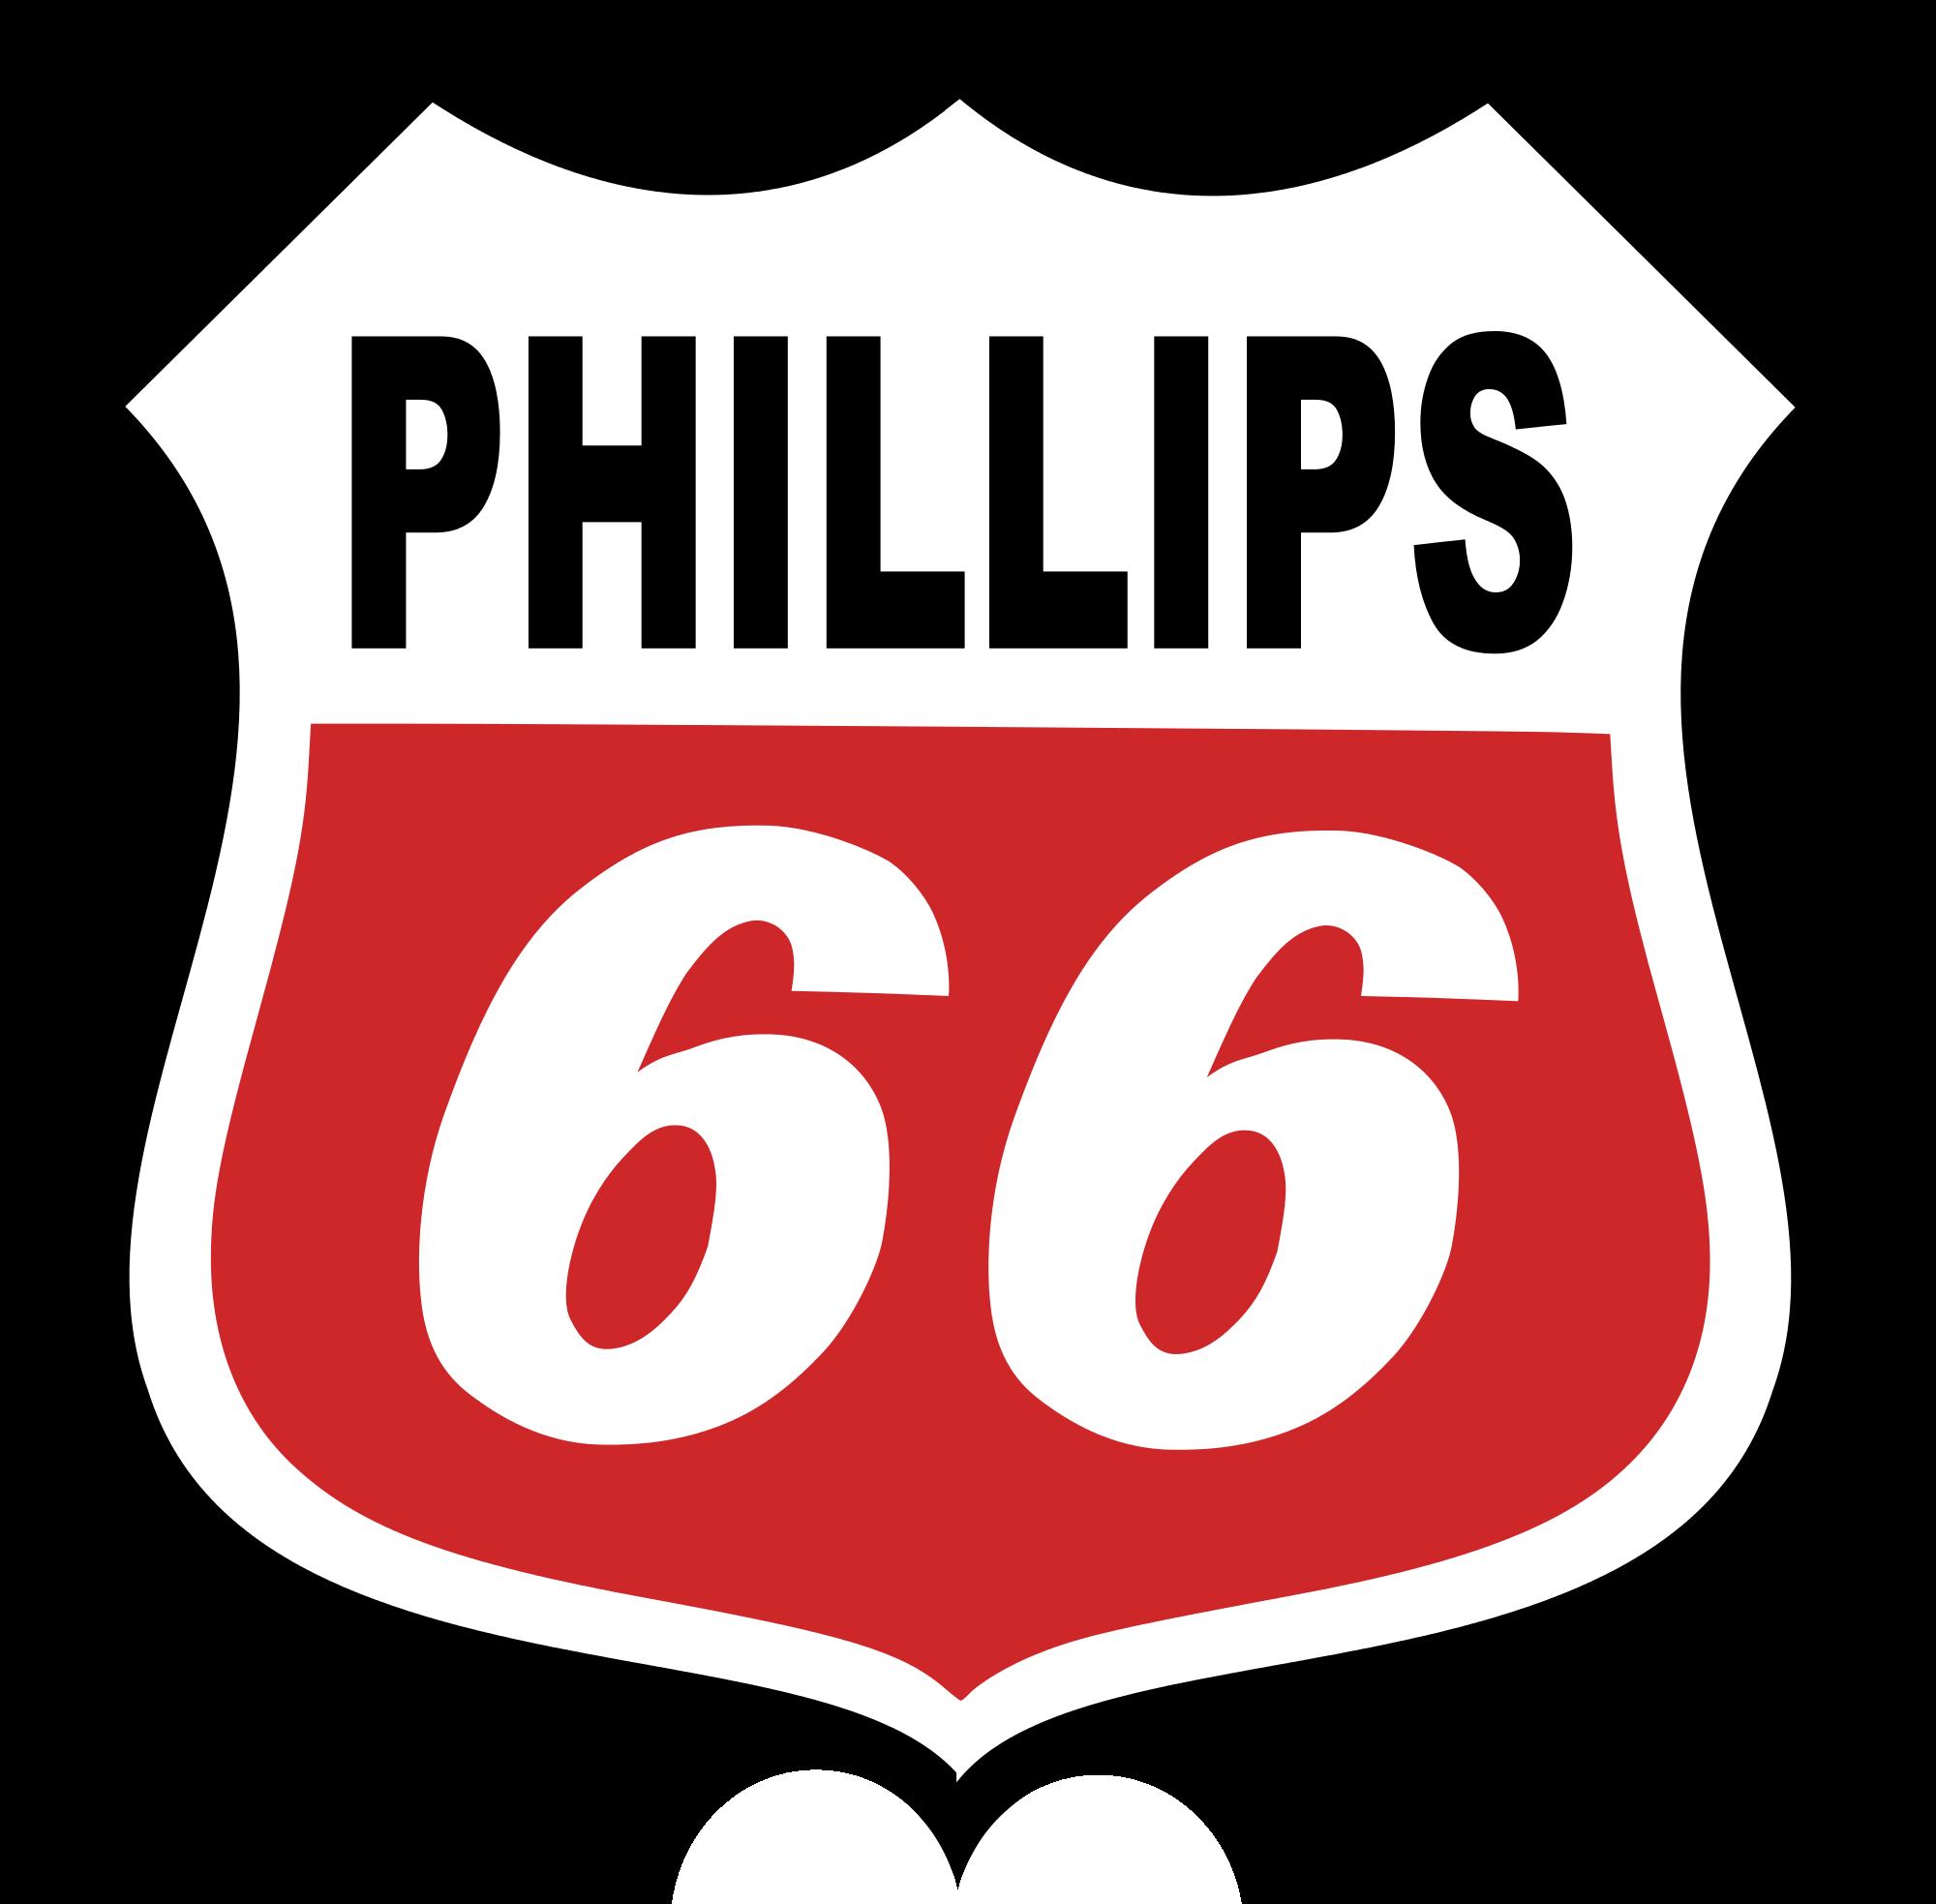 Phillips 66 Magnus Oil 68 Cross Reference